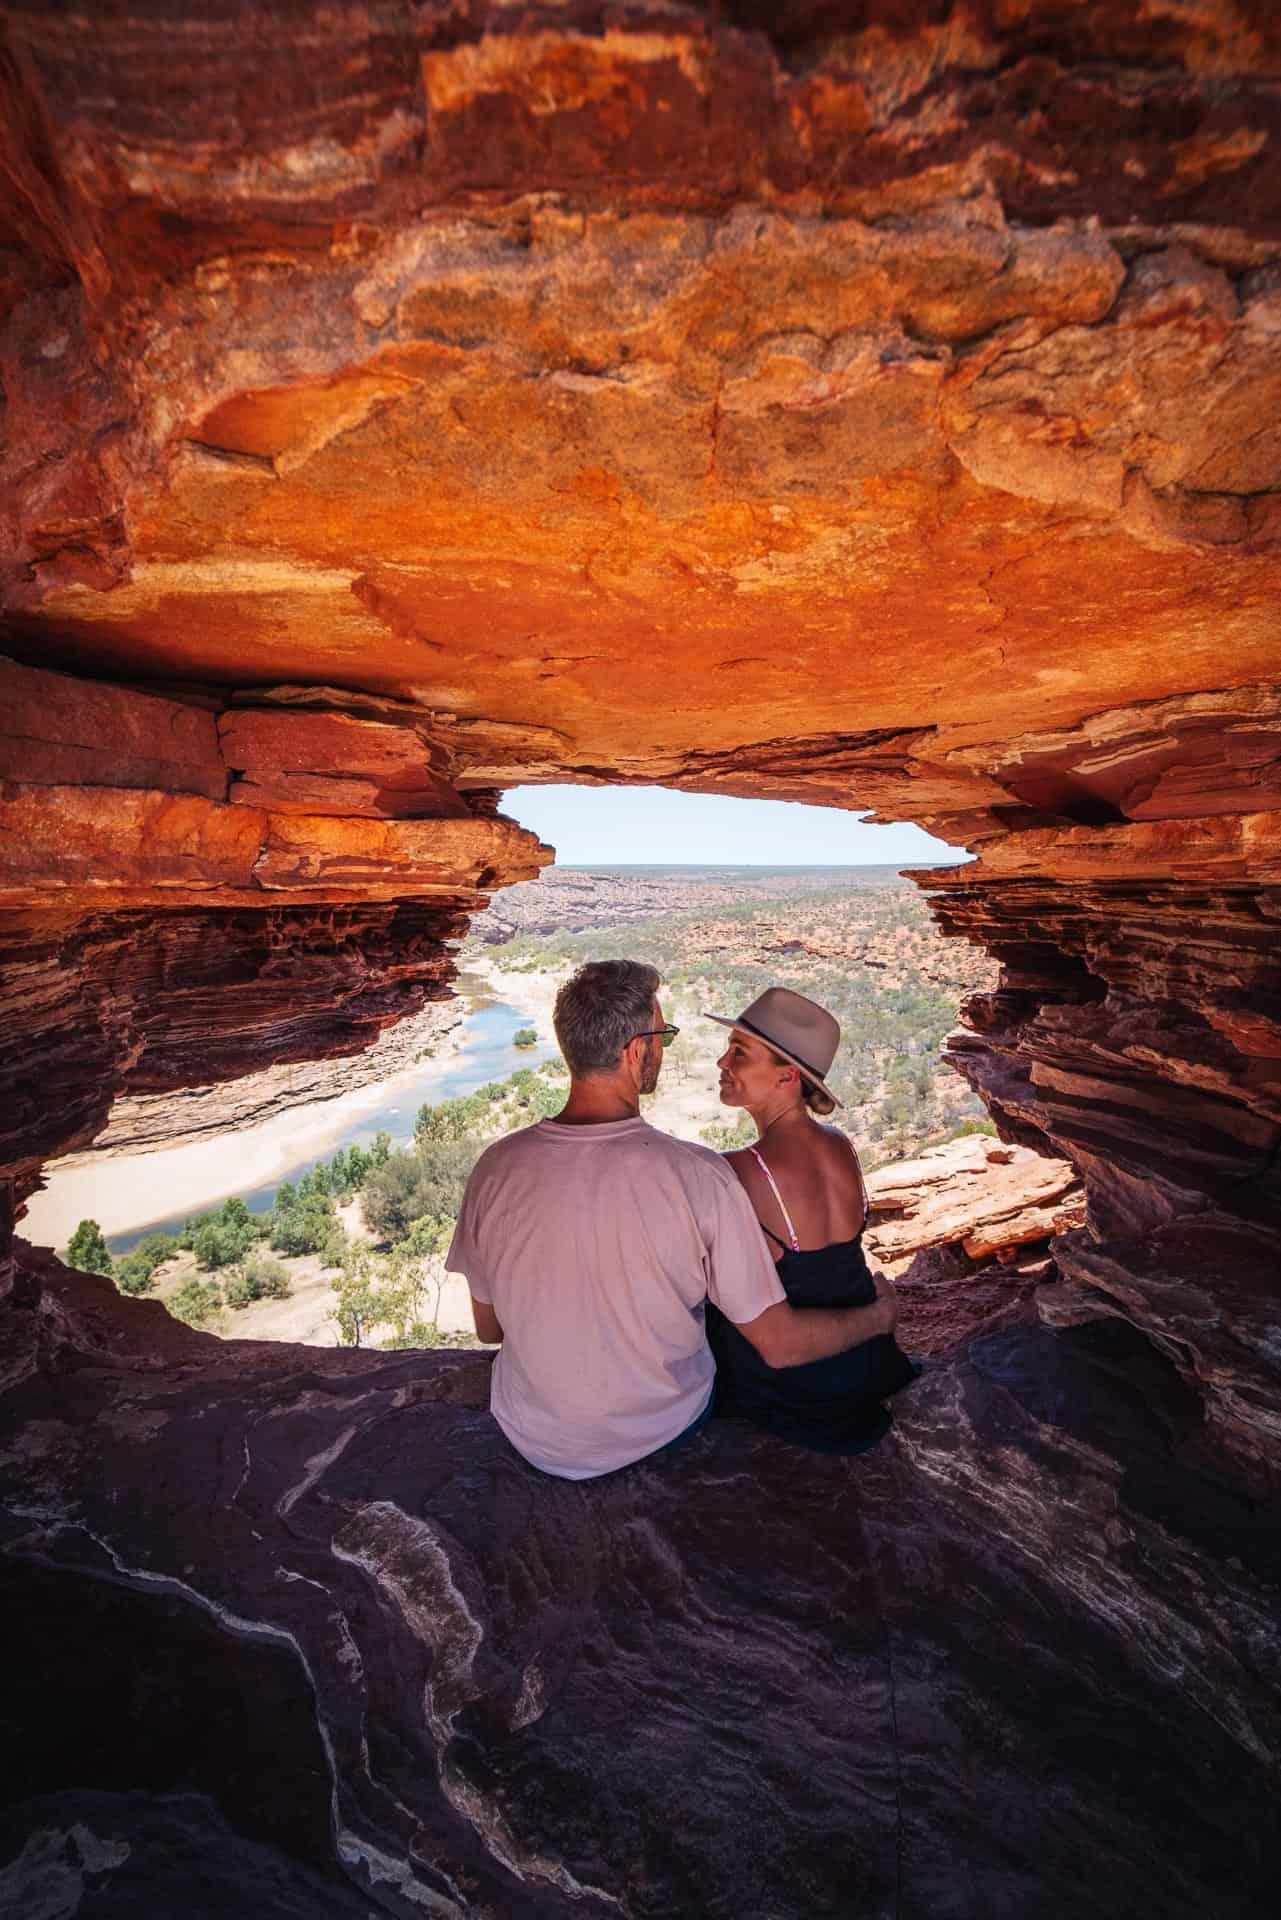 natures window, natures window kalbarri, nature's window, natures window western australia, kalbarri natures window